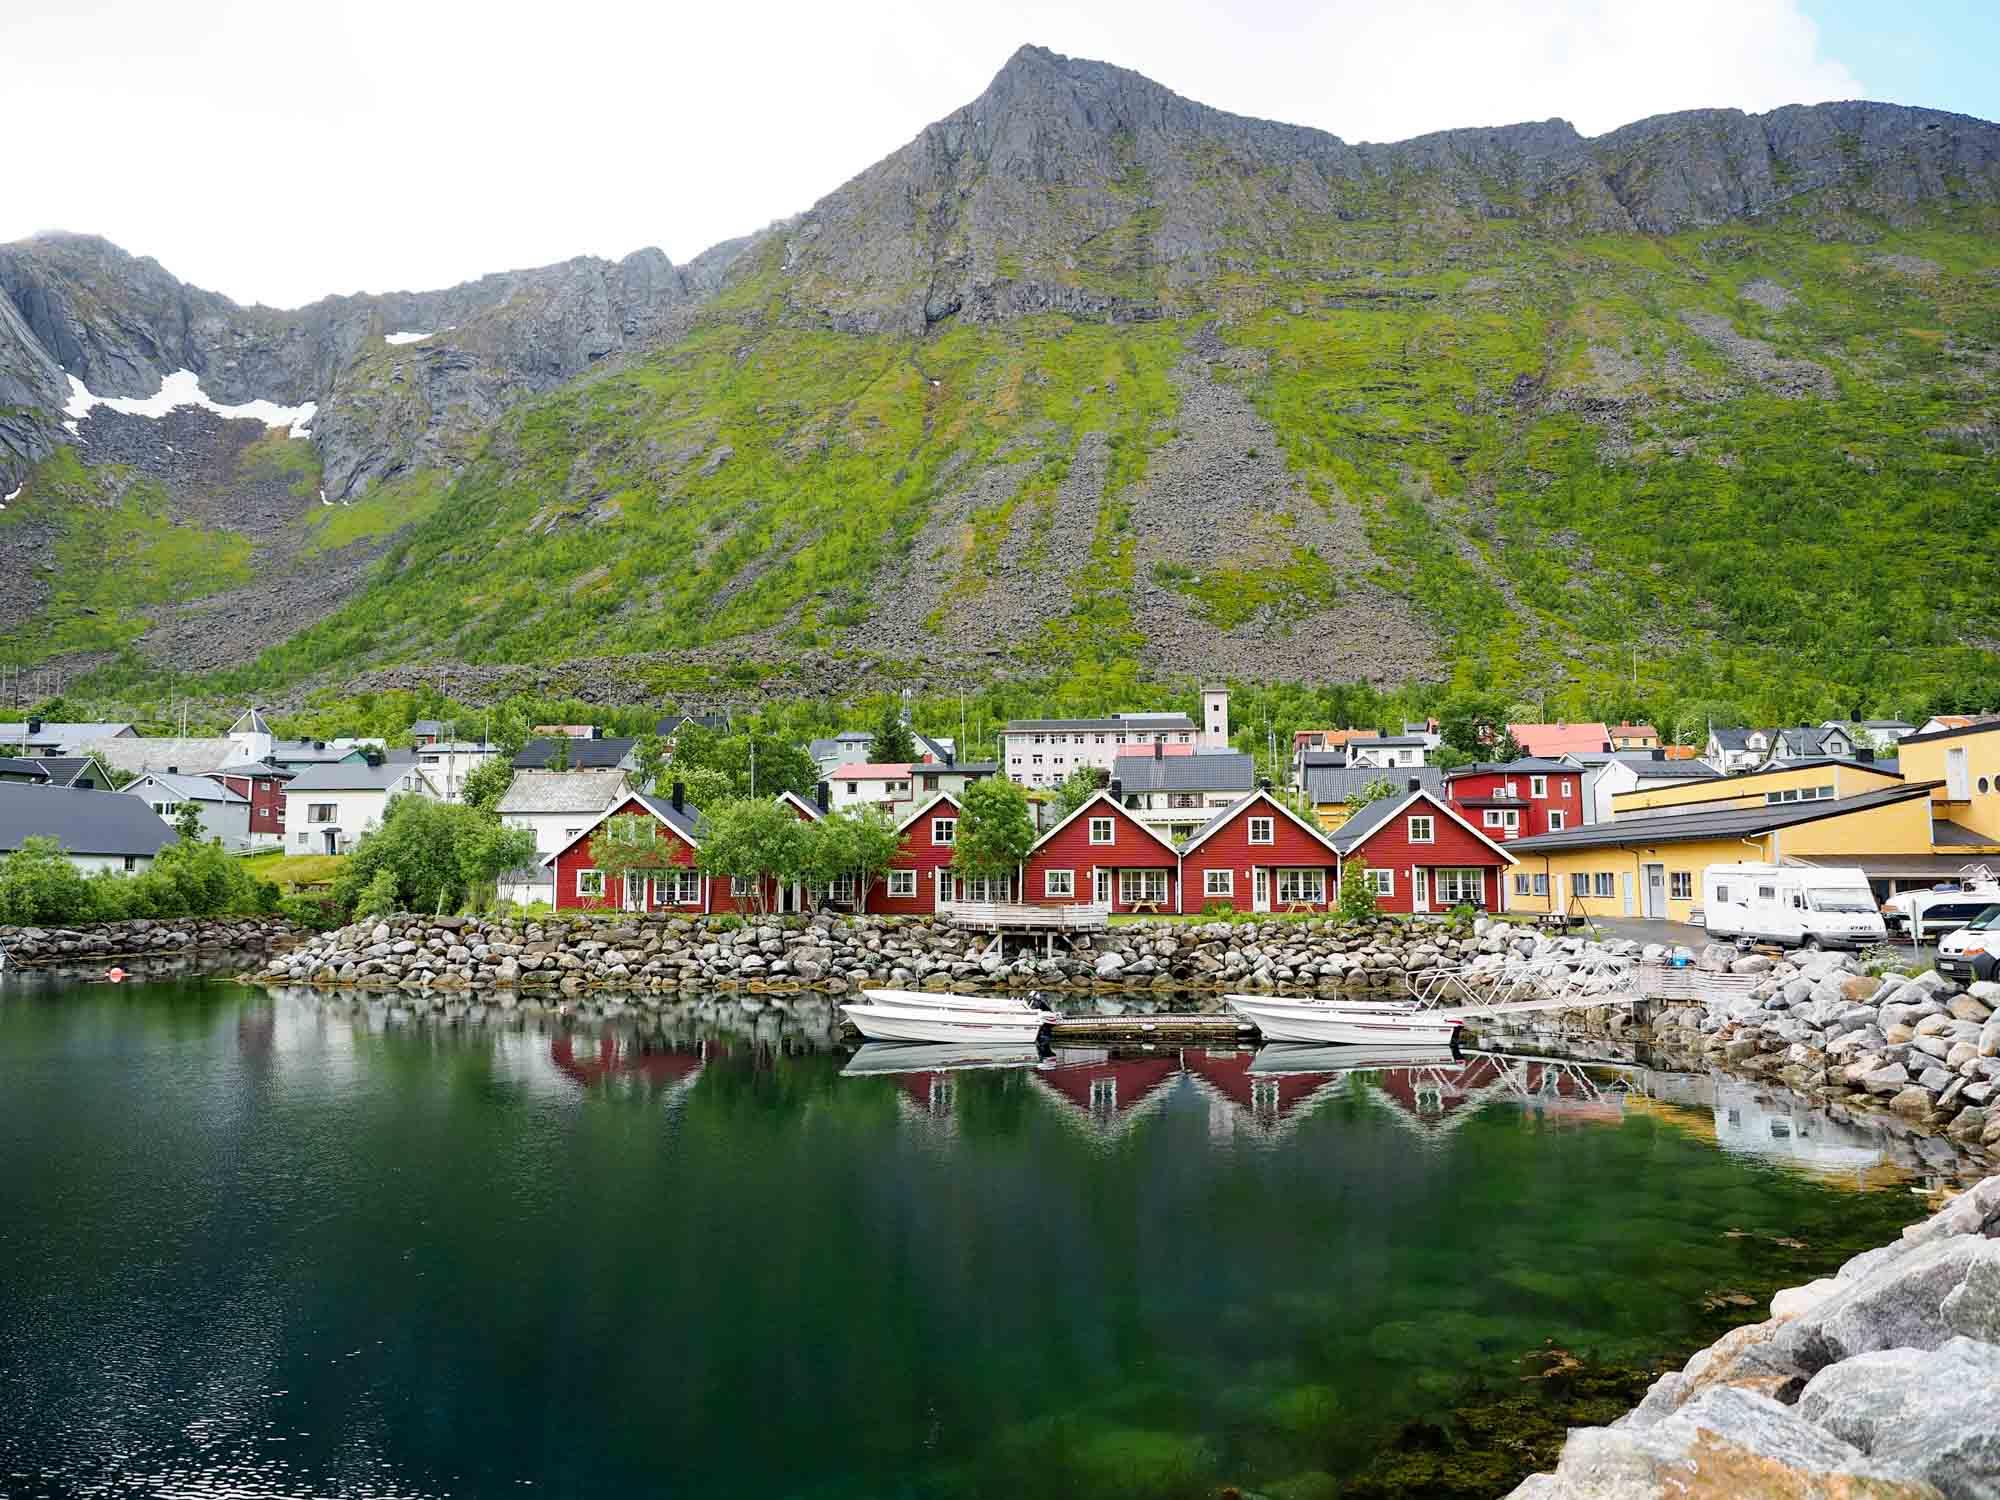 Fishing village of Gryllefjord, Norway